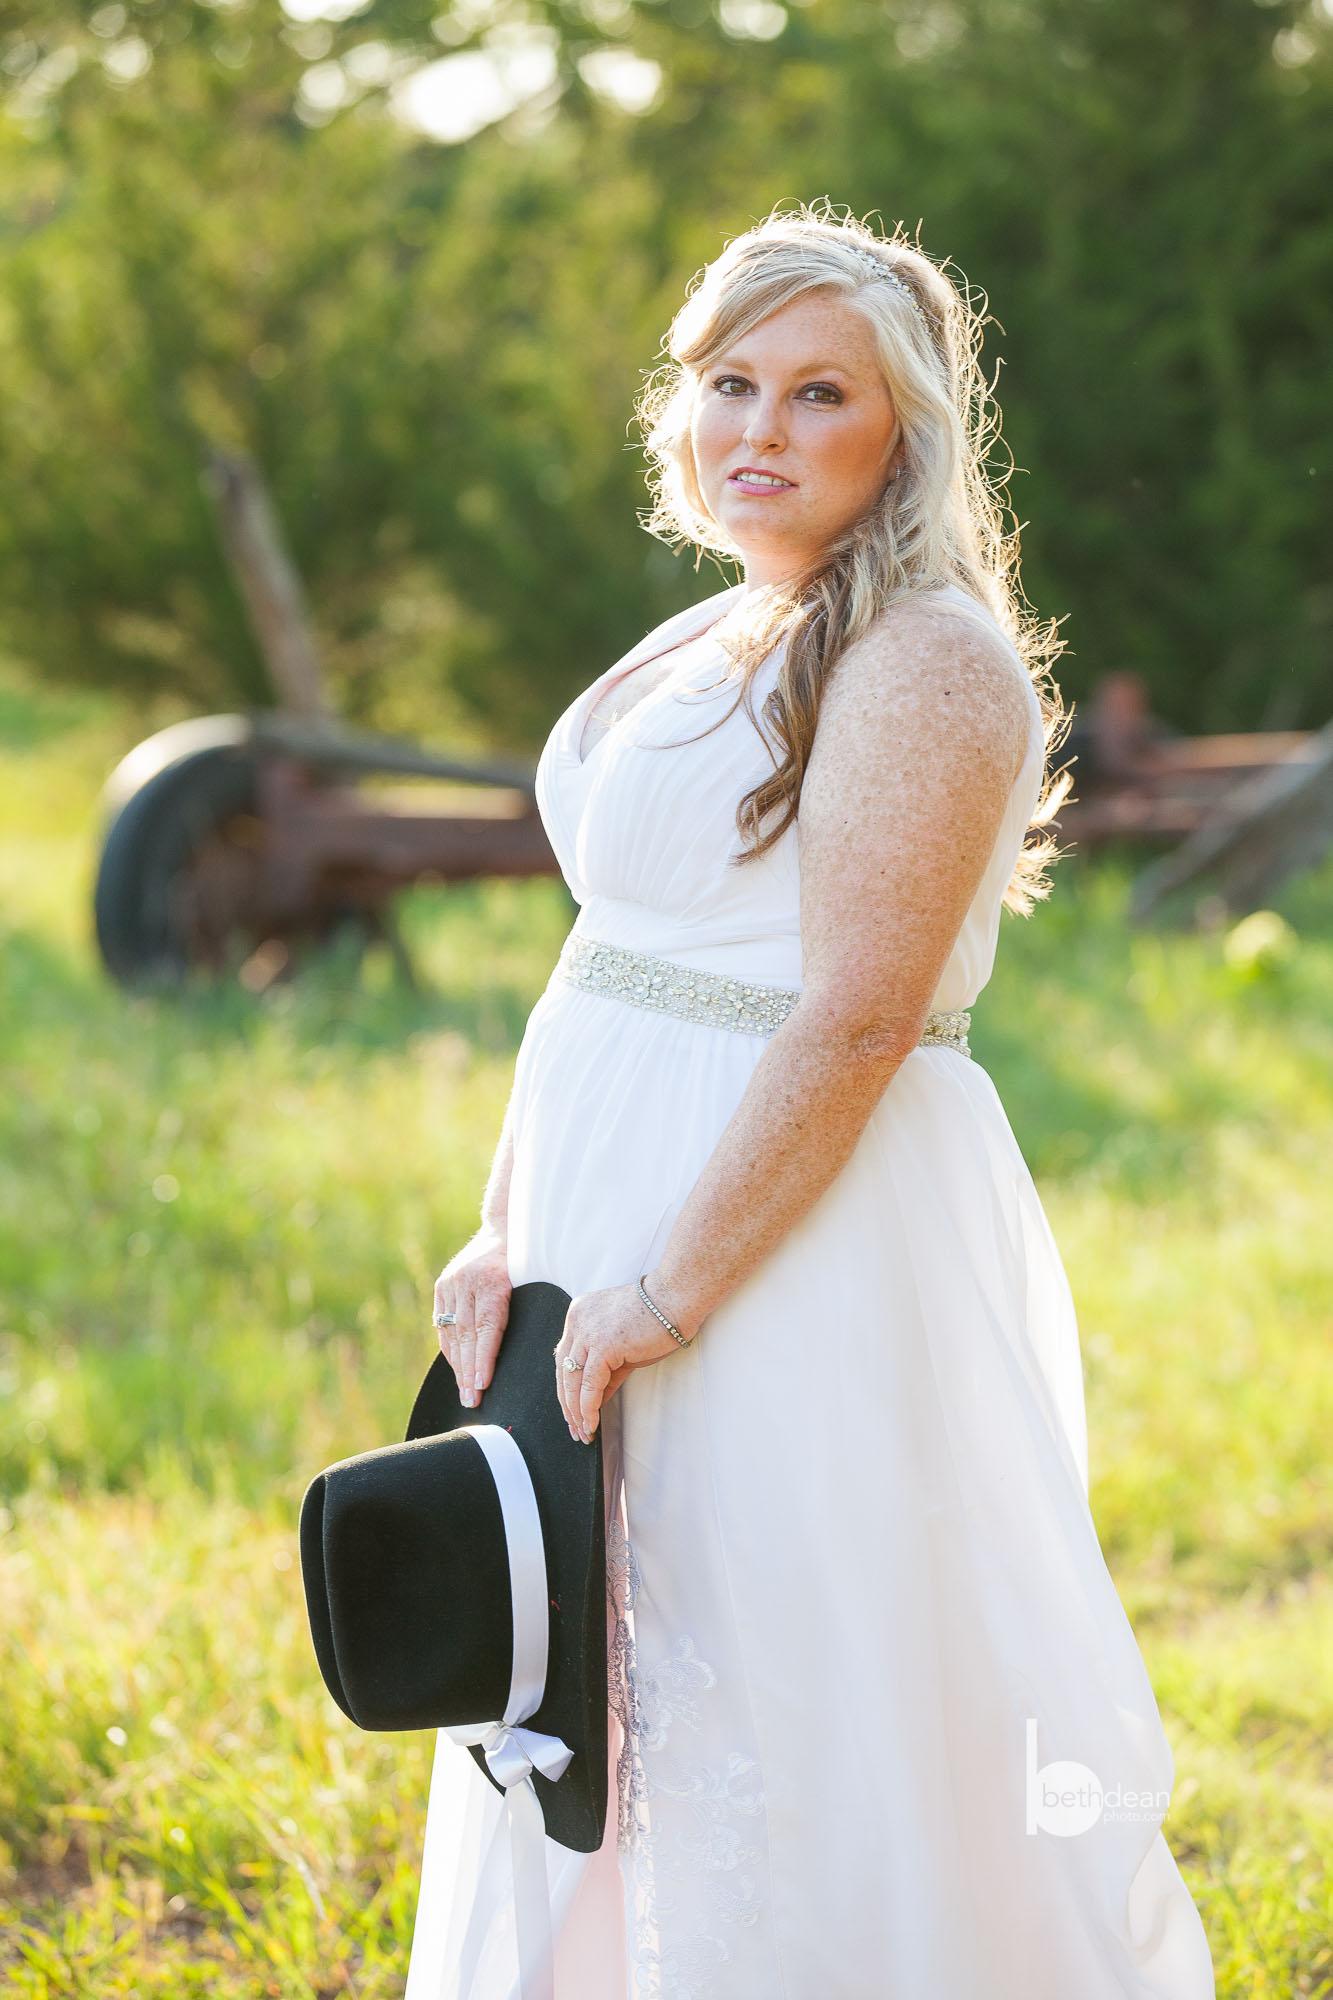 Beth Dean Photography